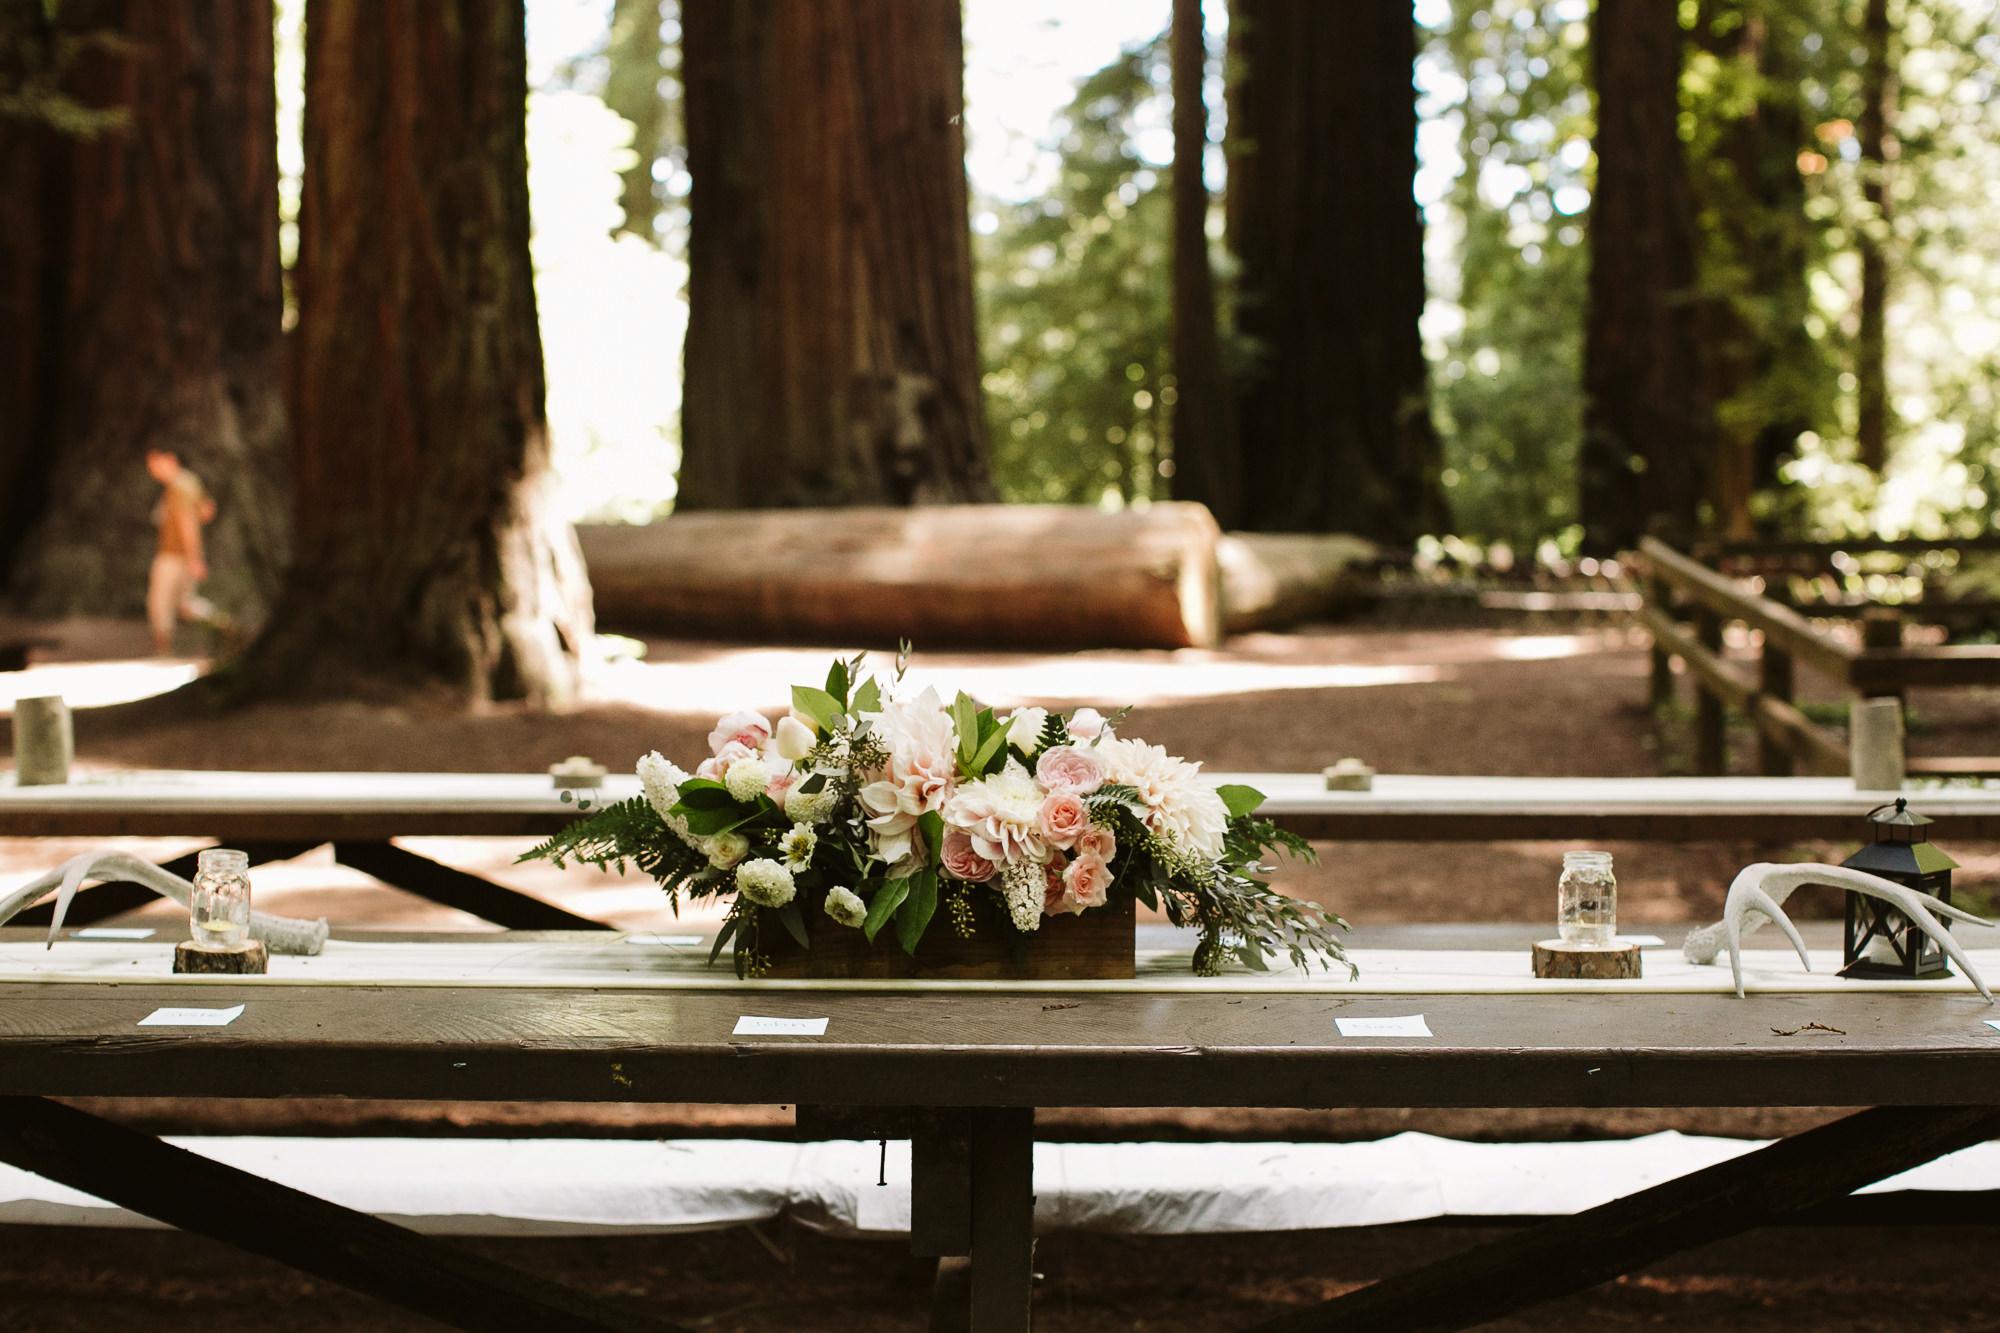 California-wedding-photographer-alfonso-flores-pamplin-groove-129.jpg